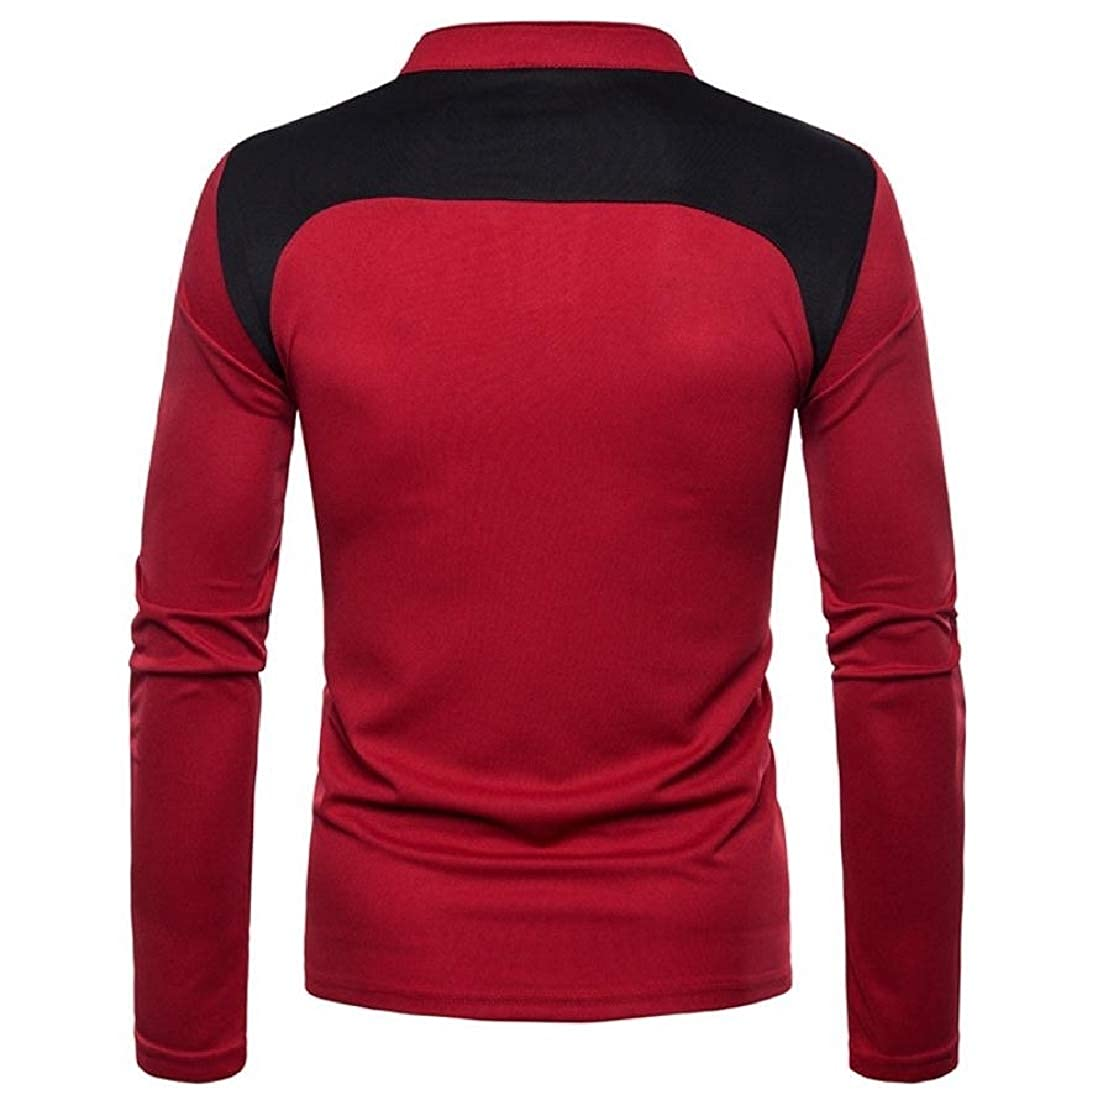 Mens Splicing Mao Collar Tops Pullover Fashion T-Shirts